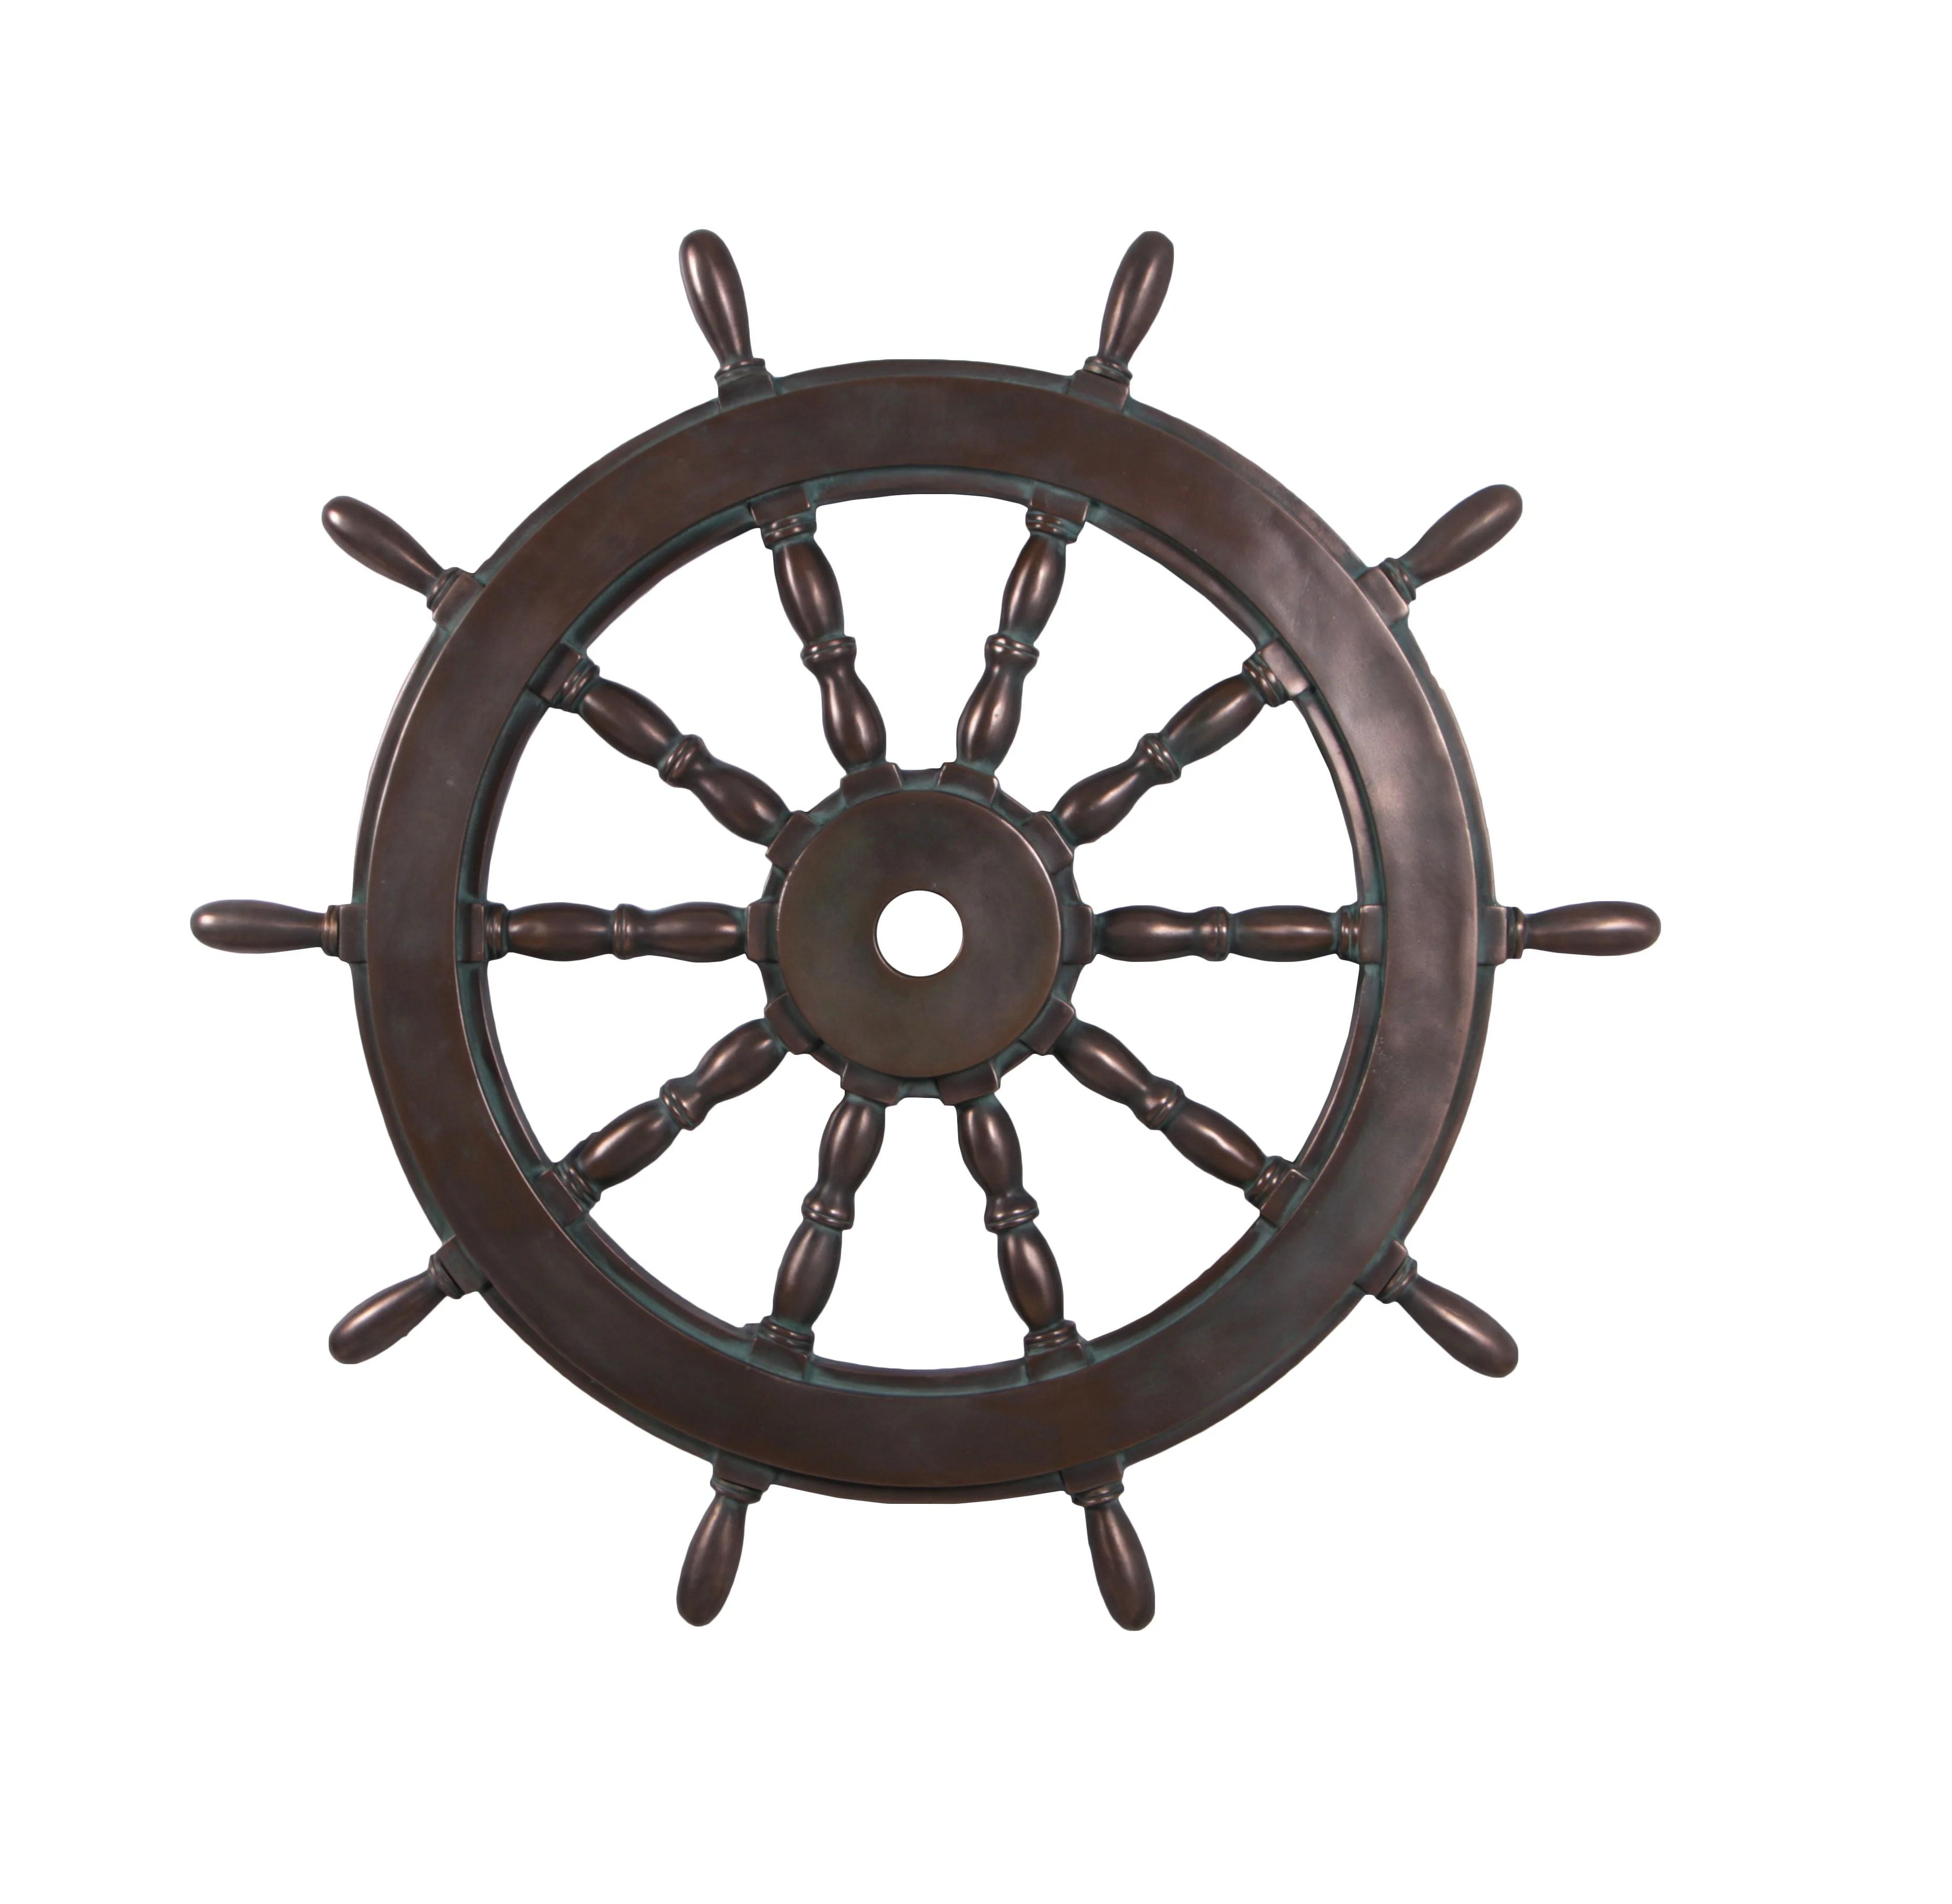 Shipwheels